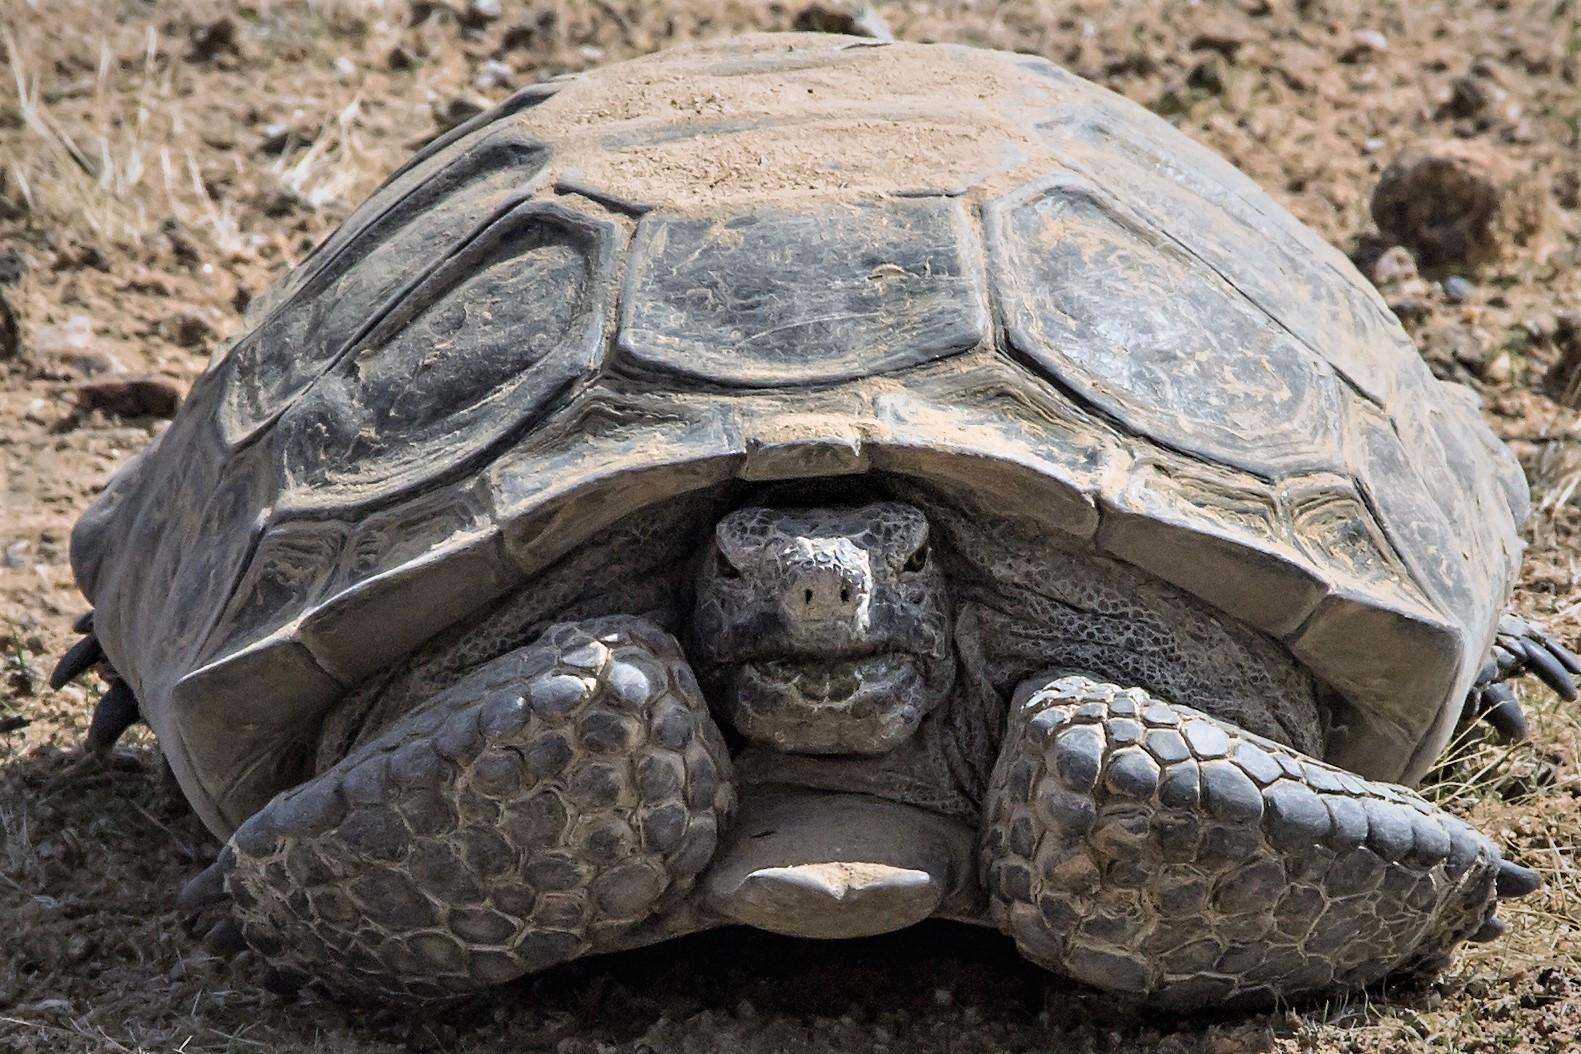 Tortoise event-1-2ww.jpg